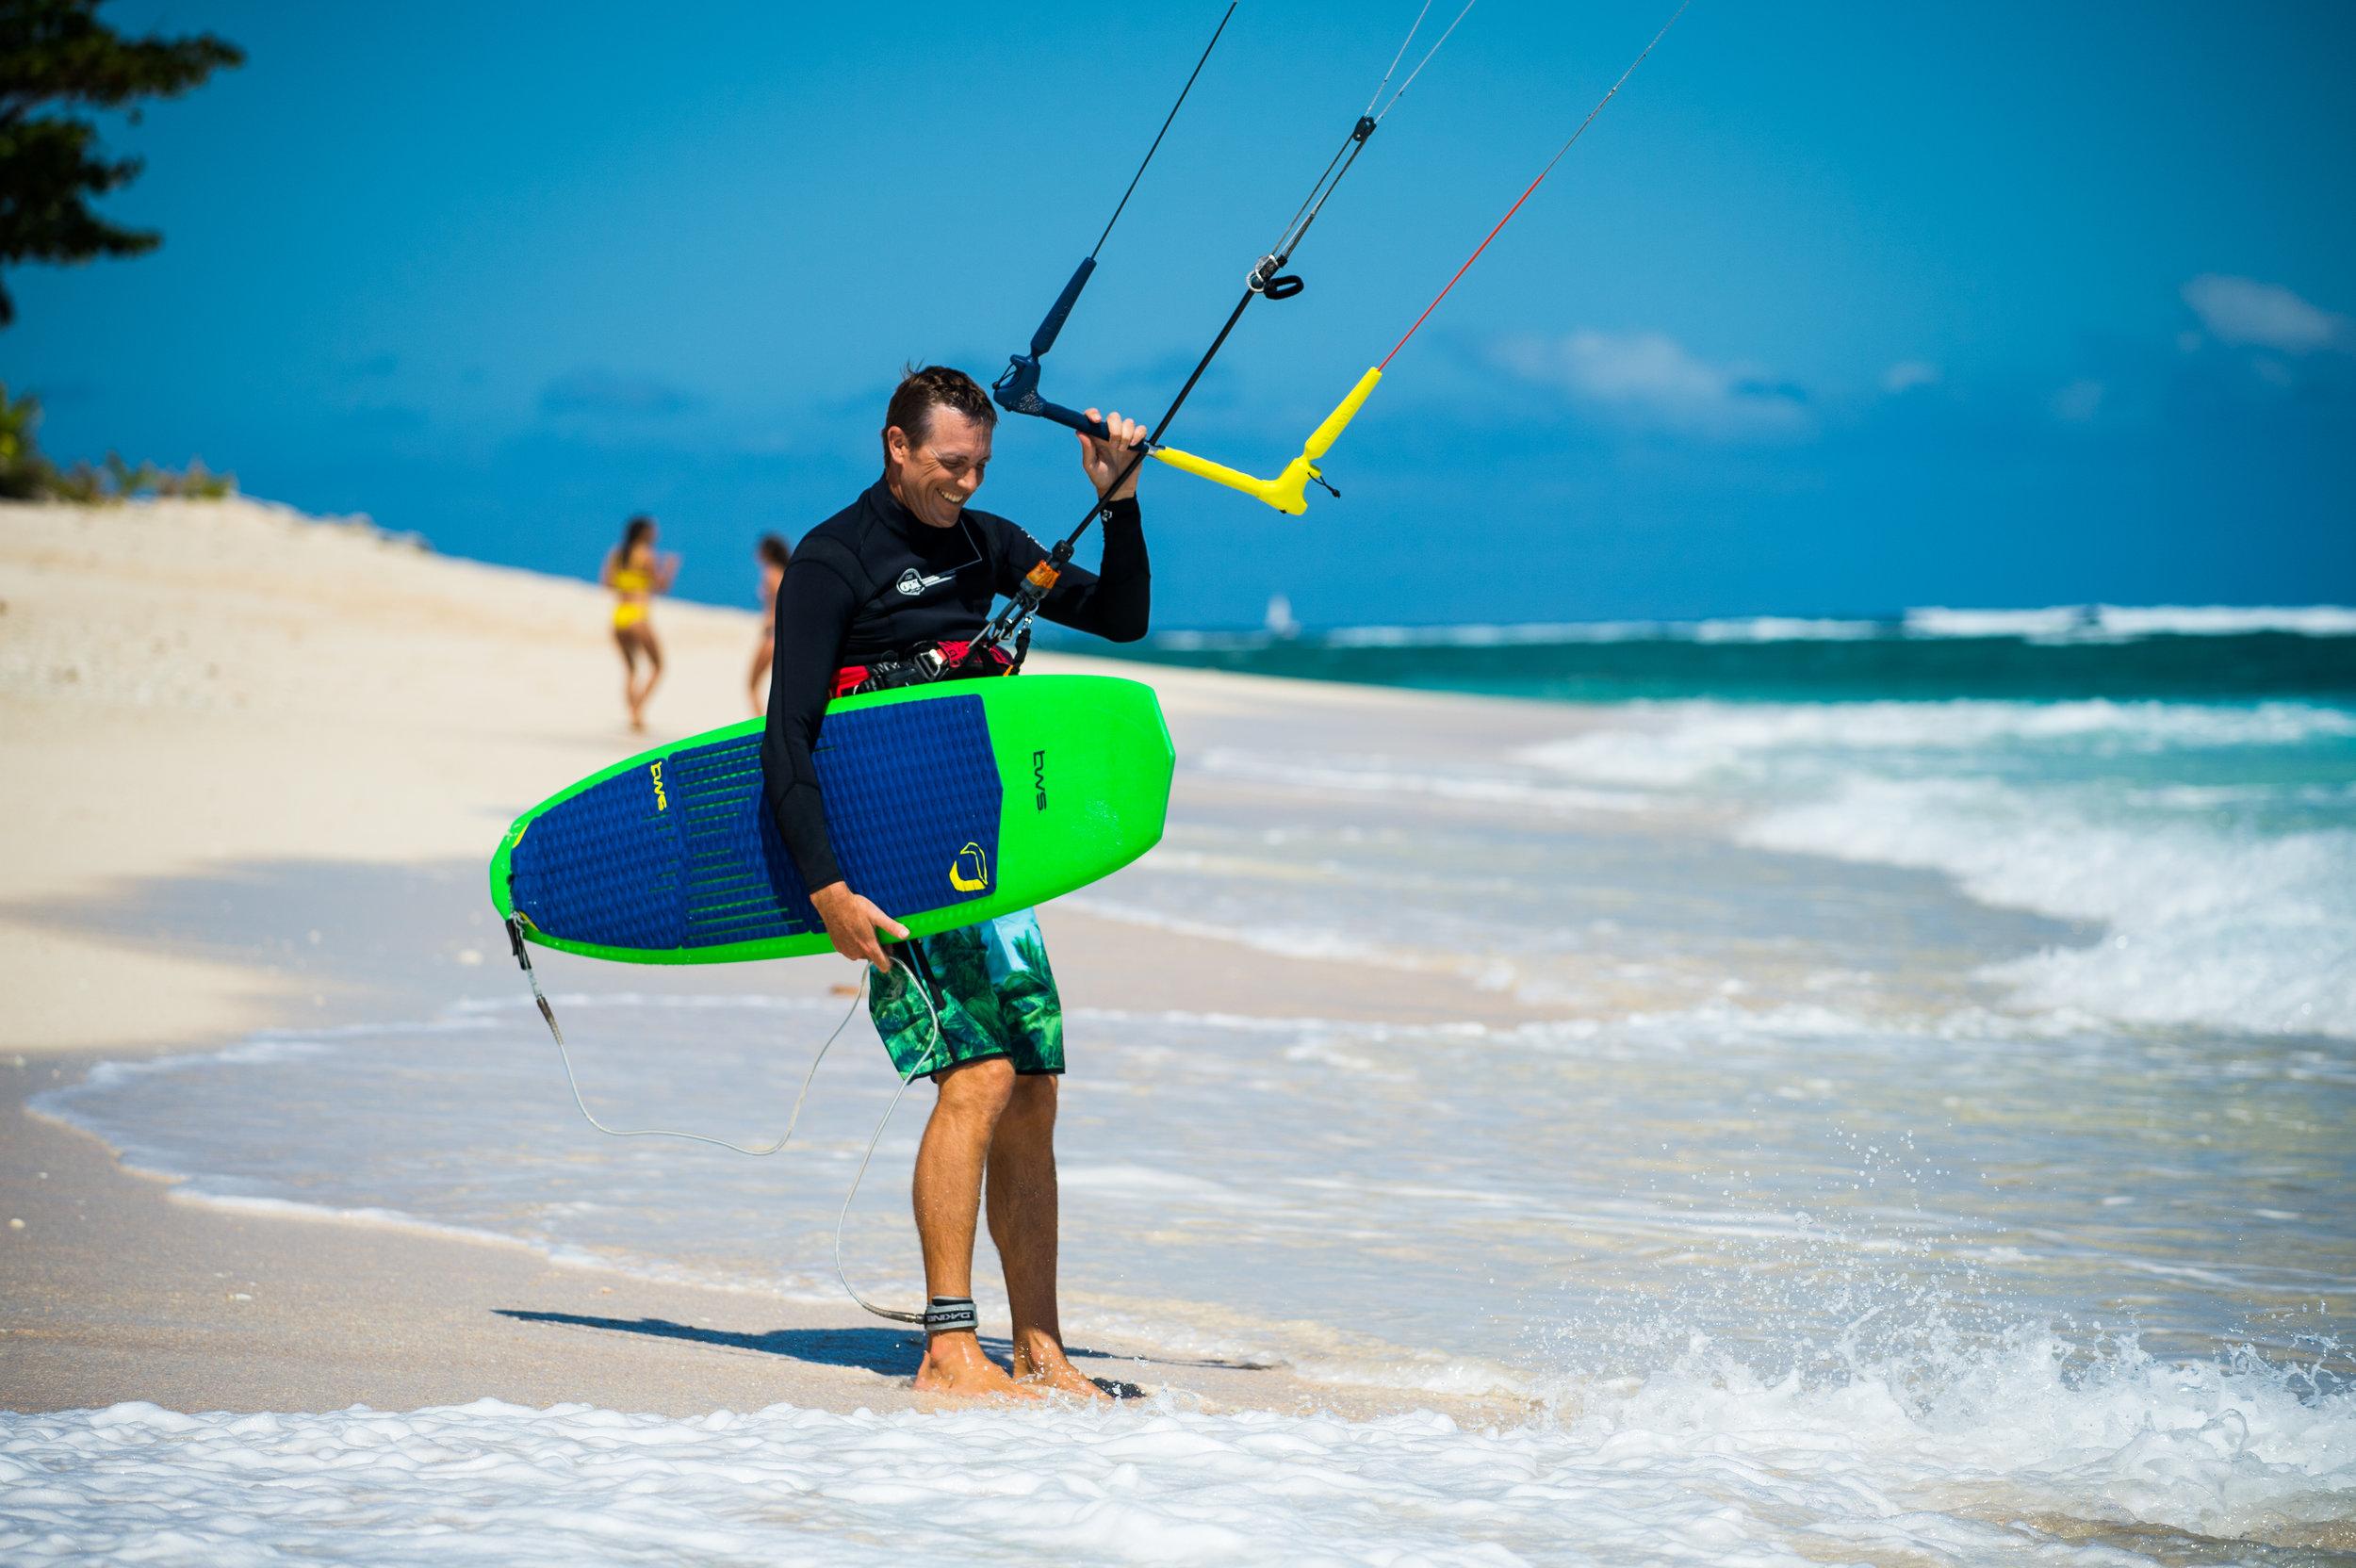 Fins & Traction for kitesurfing -